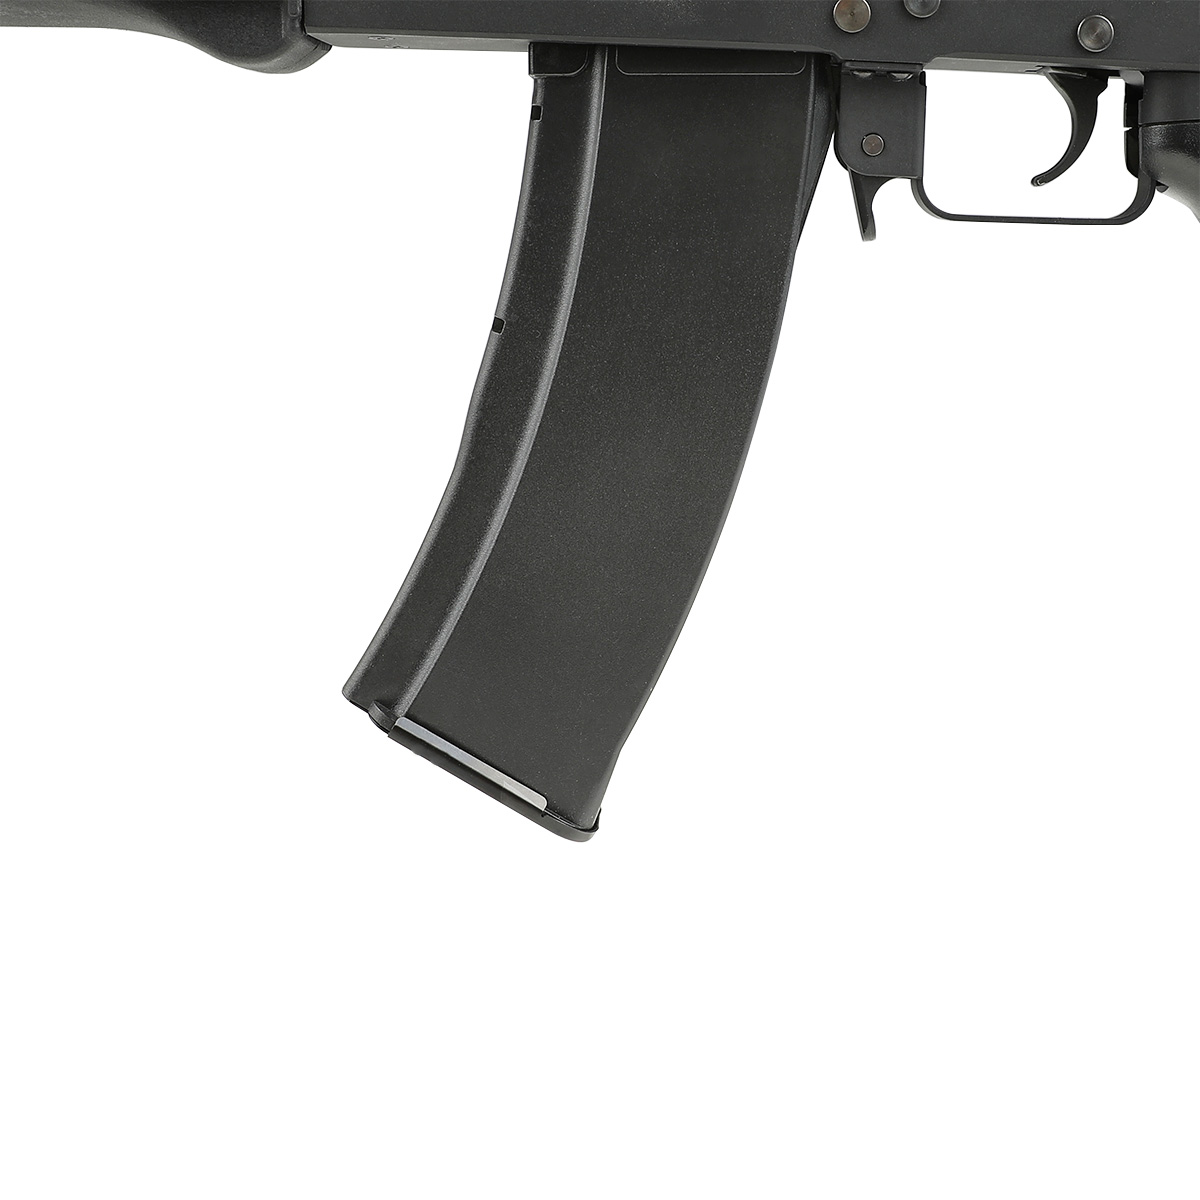 【同梱不可】 SRC AK74M フルメタル電動ガン NV (JP Ver.) 【配送業者:佐川急便限定】